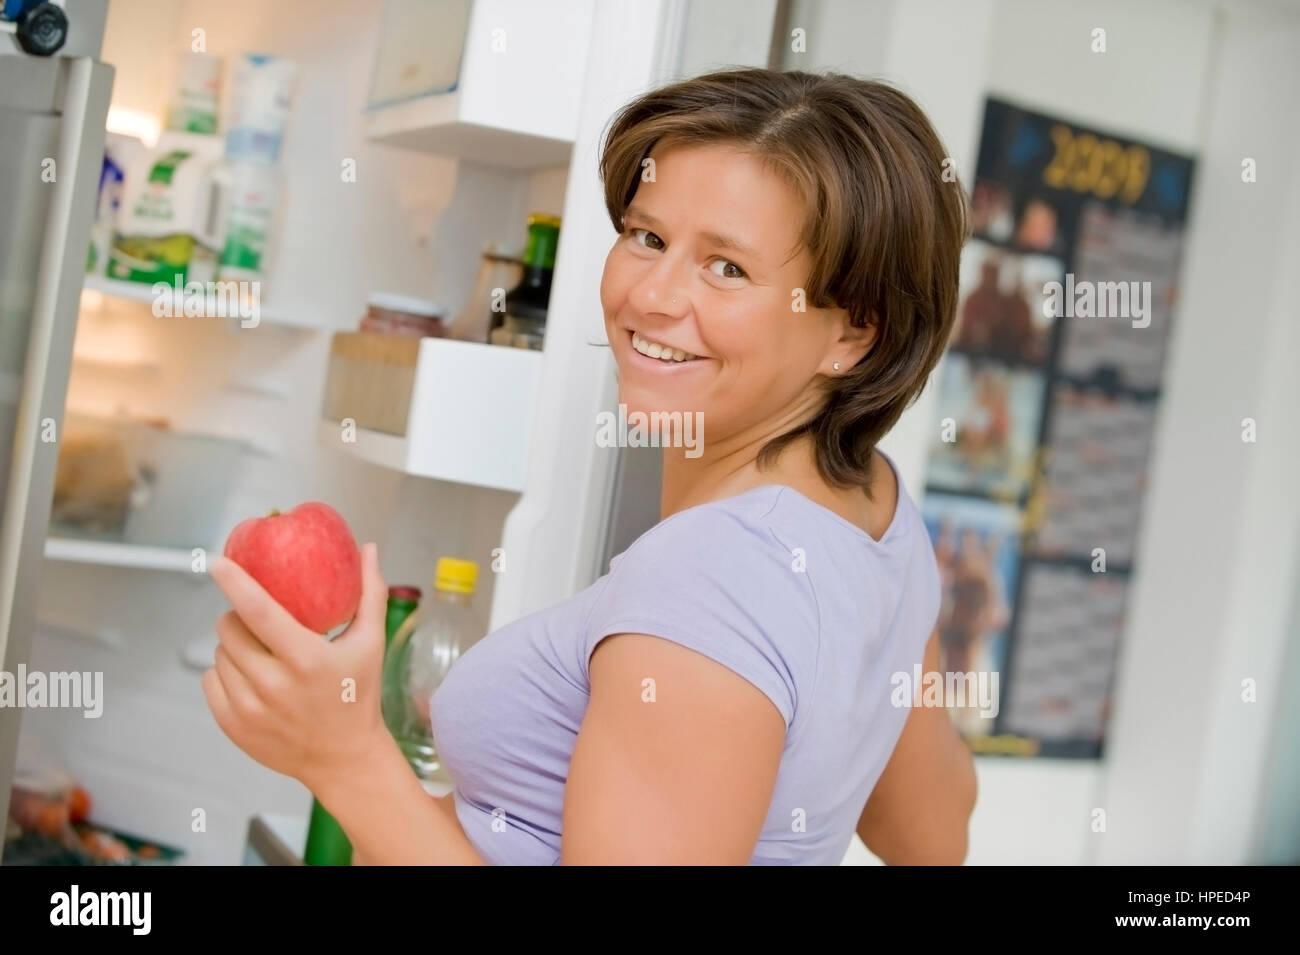 Model released , Junge, lachende Frau nimmt Apfel aus dem Kuehlschrank - woman with an apple in hand - Stock Image